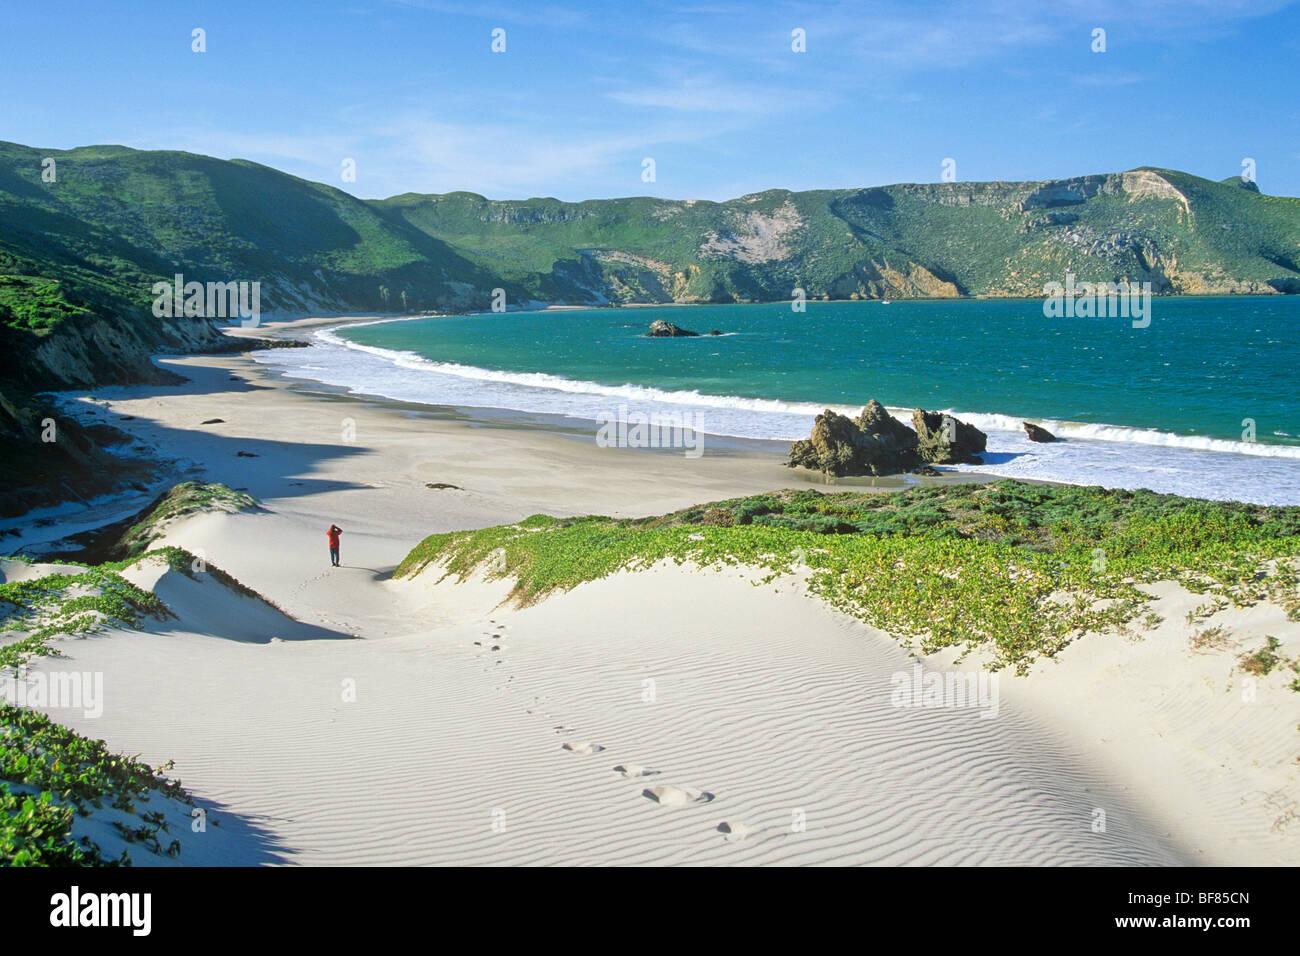 San Miguel Island Channel Islands National Park California